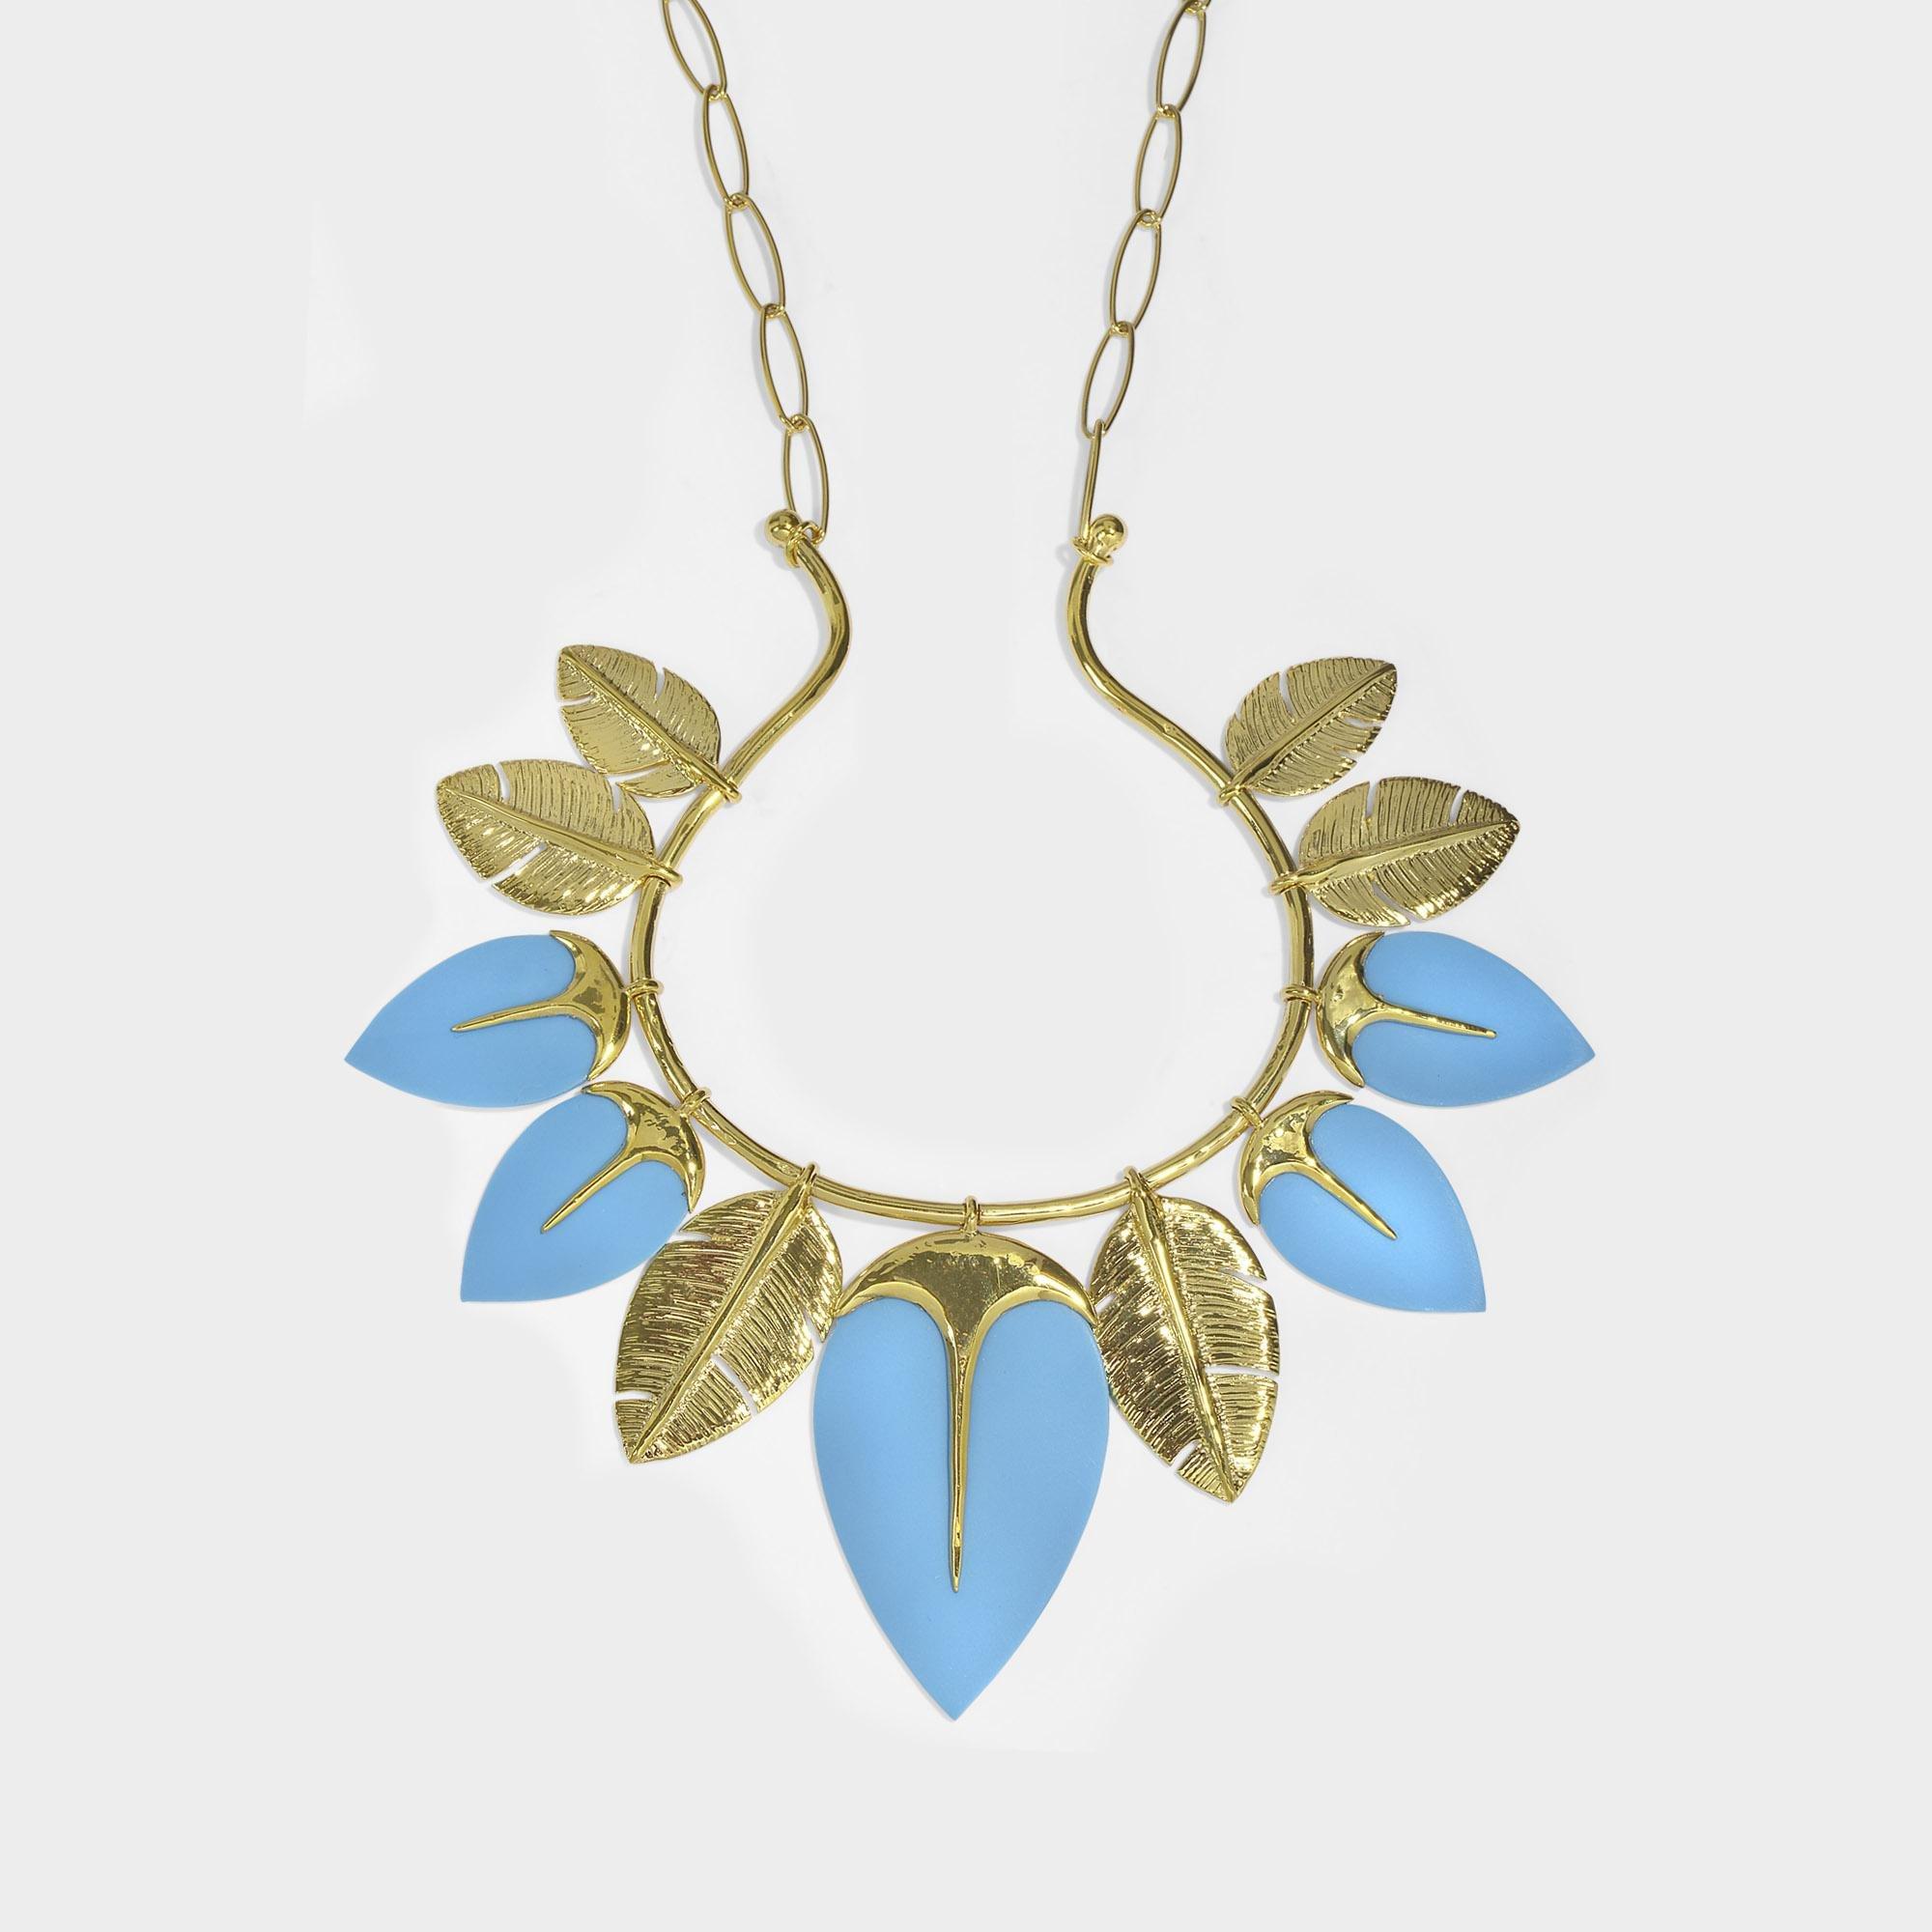 Aurélie Bidermann Wheat 13 Cobs Long Necklace in 18K Gold-Plated Brass 6GcgPO